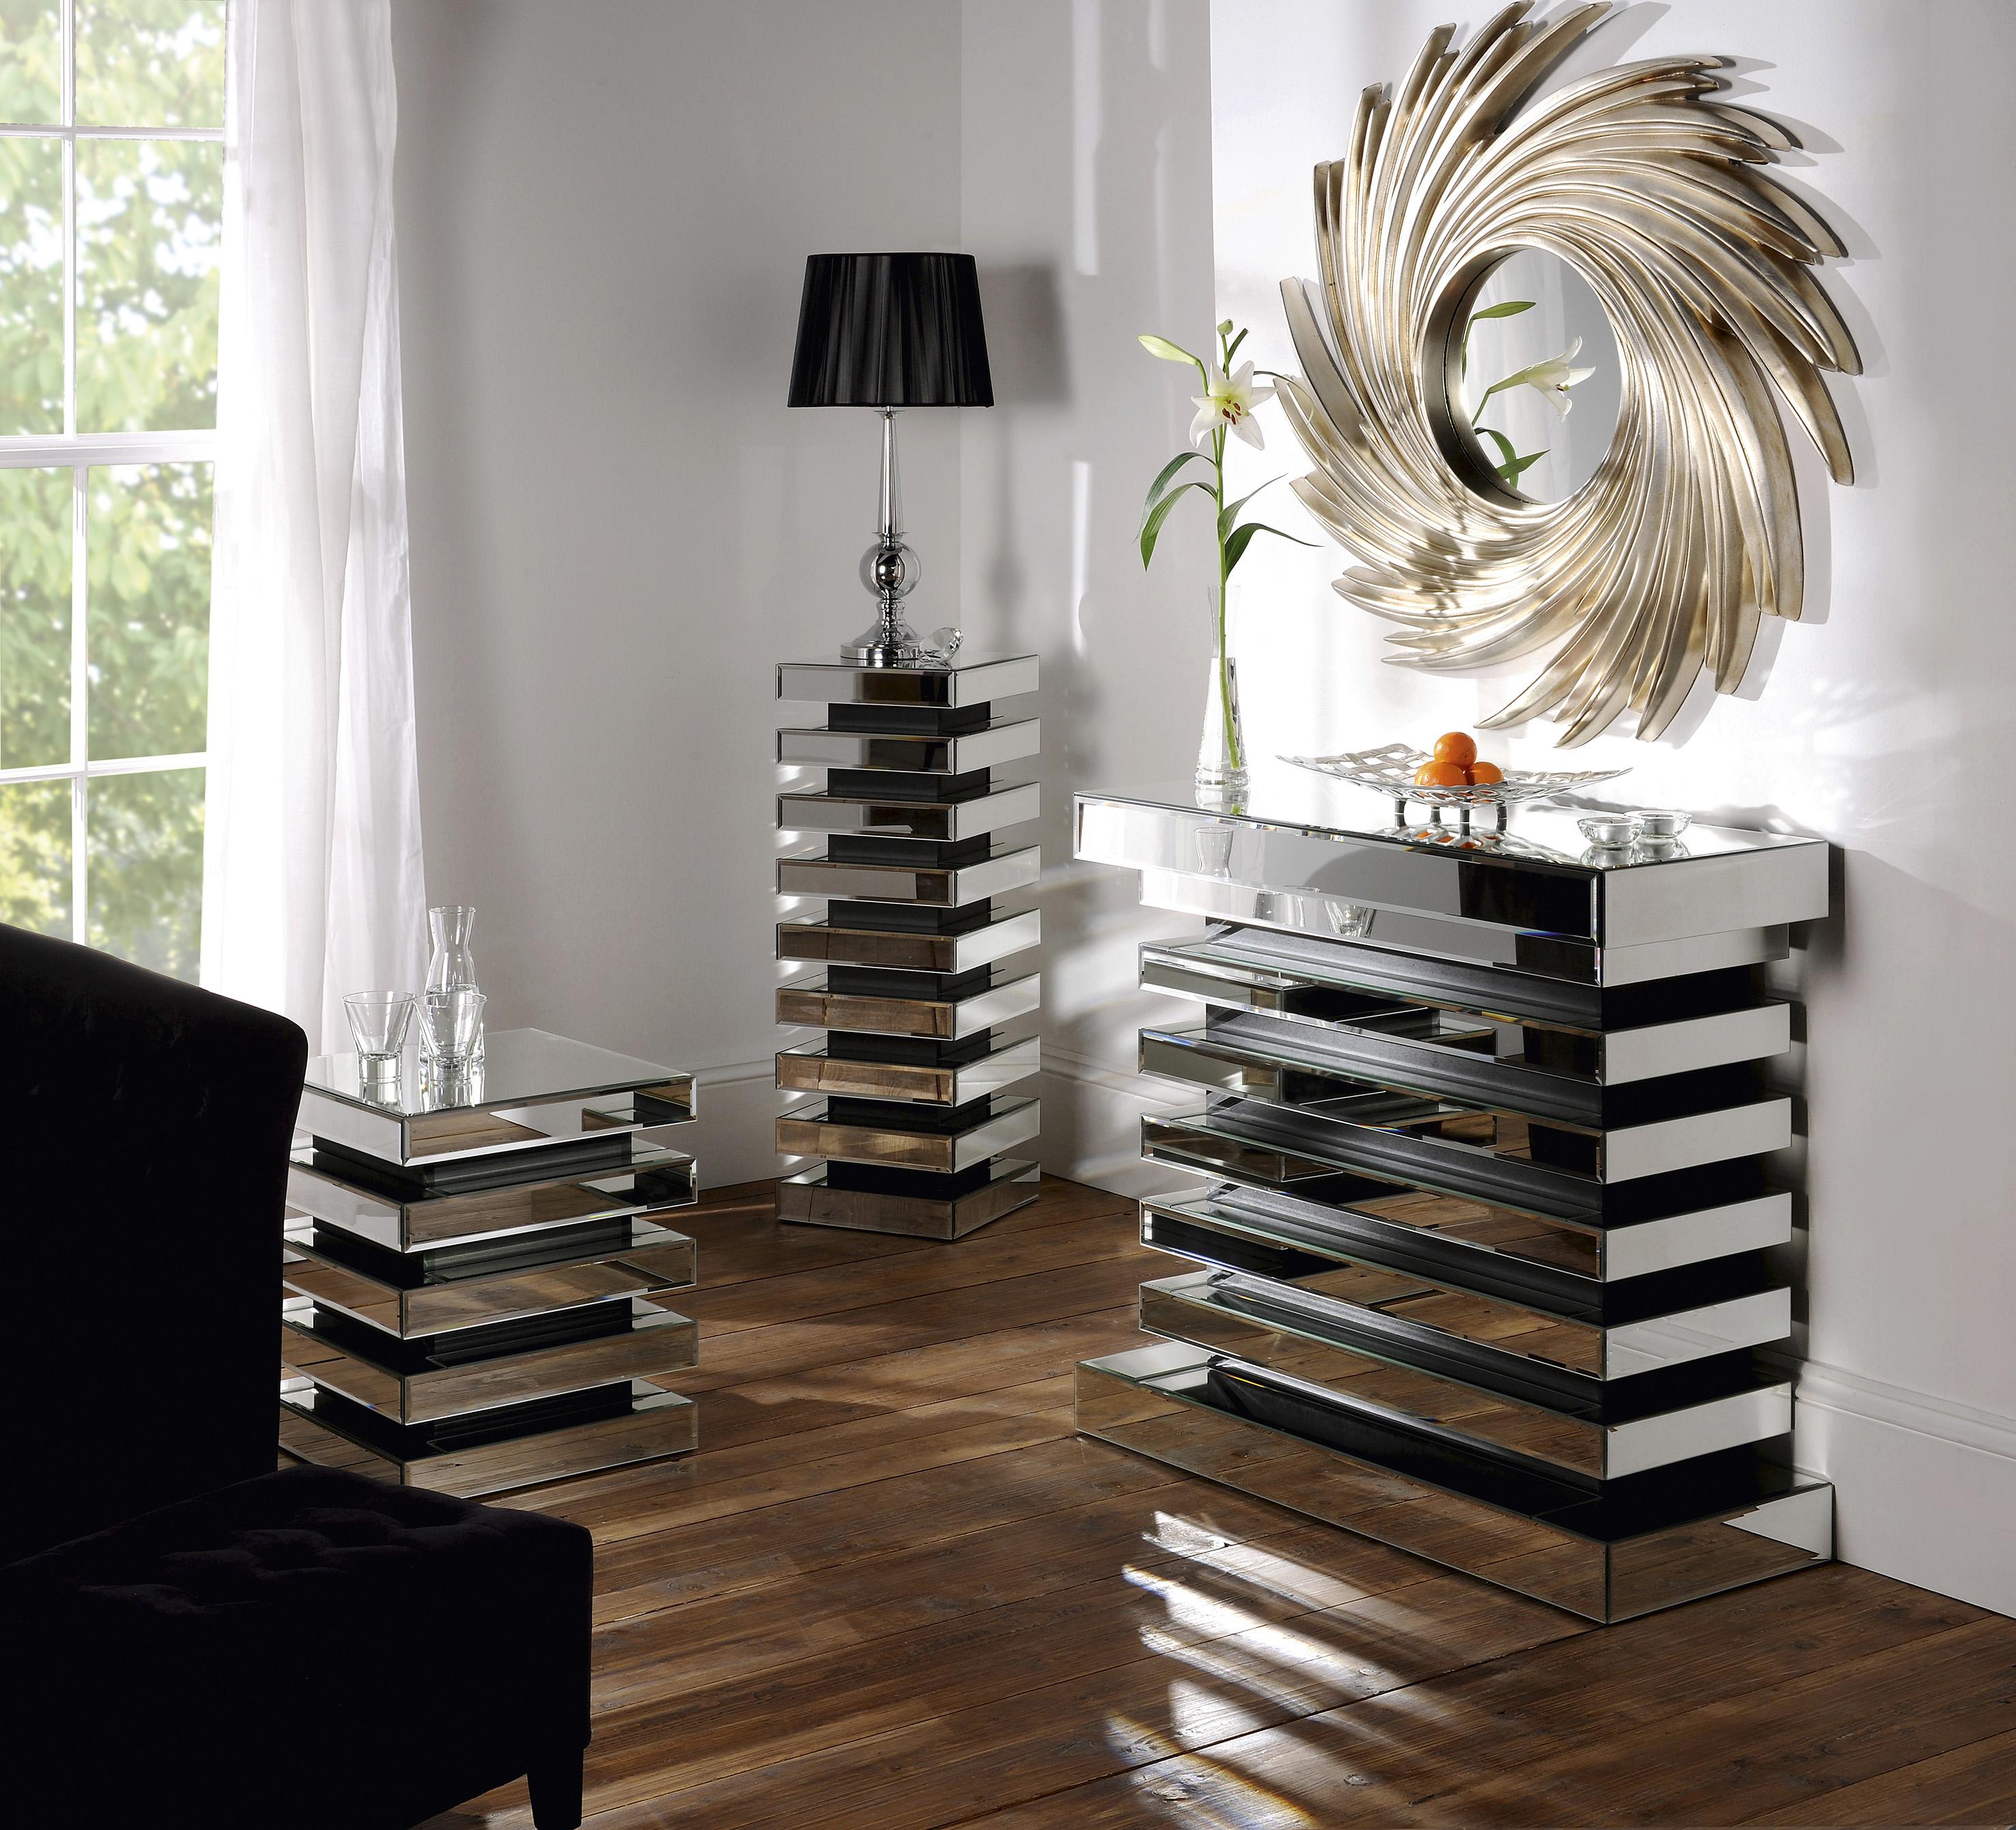 Mirrored Living Room Furniture Uk - Living Room Ideas